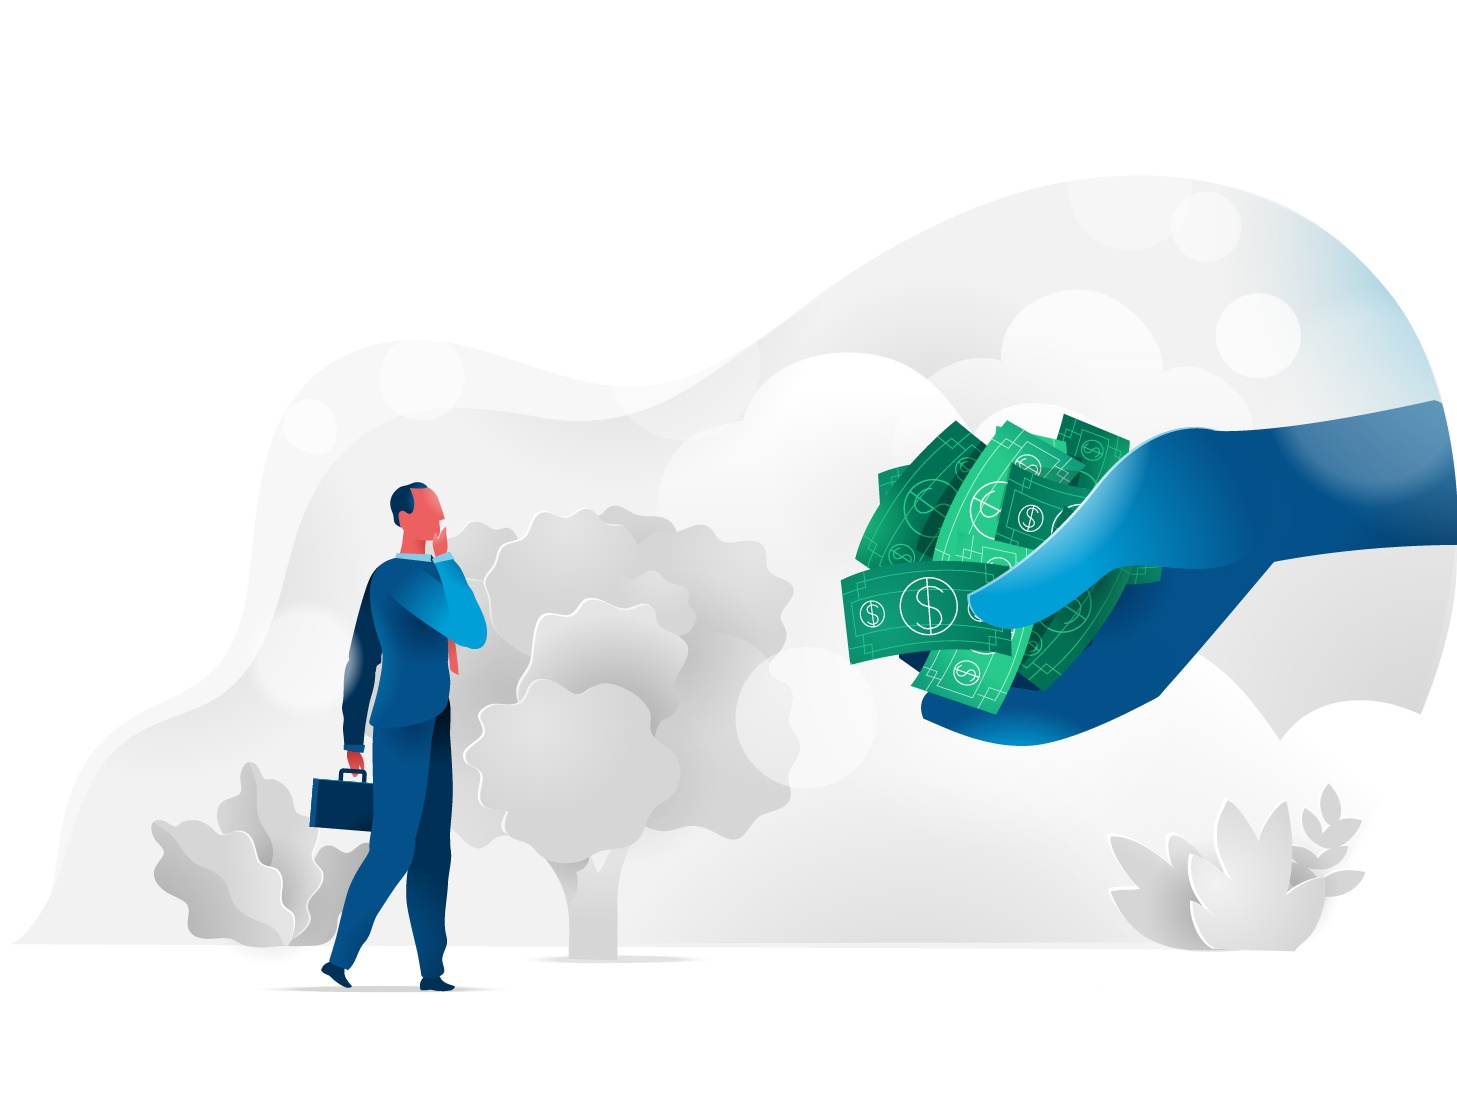 Money For Nothing   Salesforce Journey Collection #1 salesforce hurca temptation illusion dream success money business